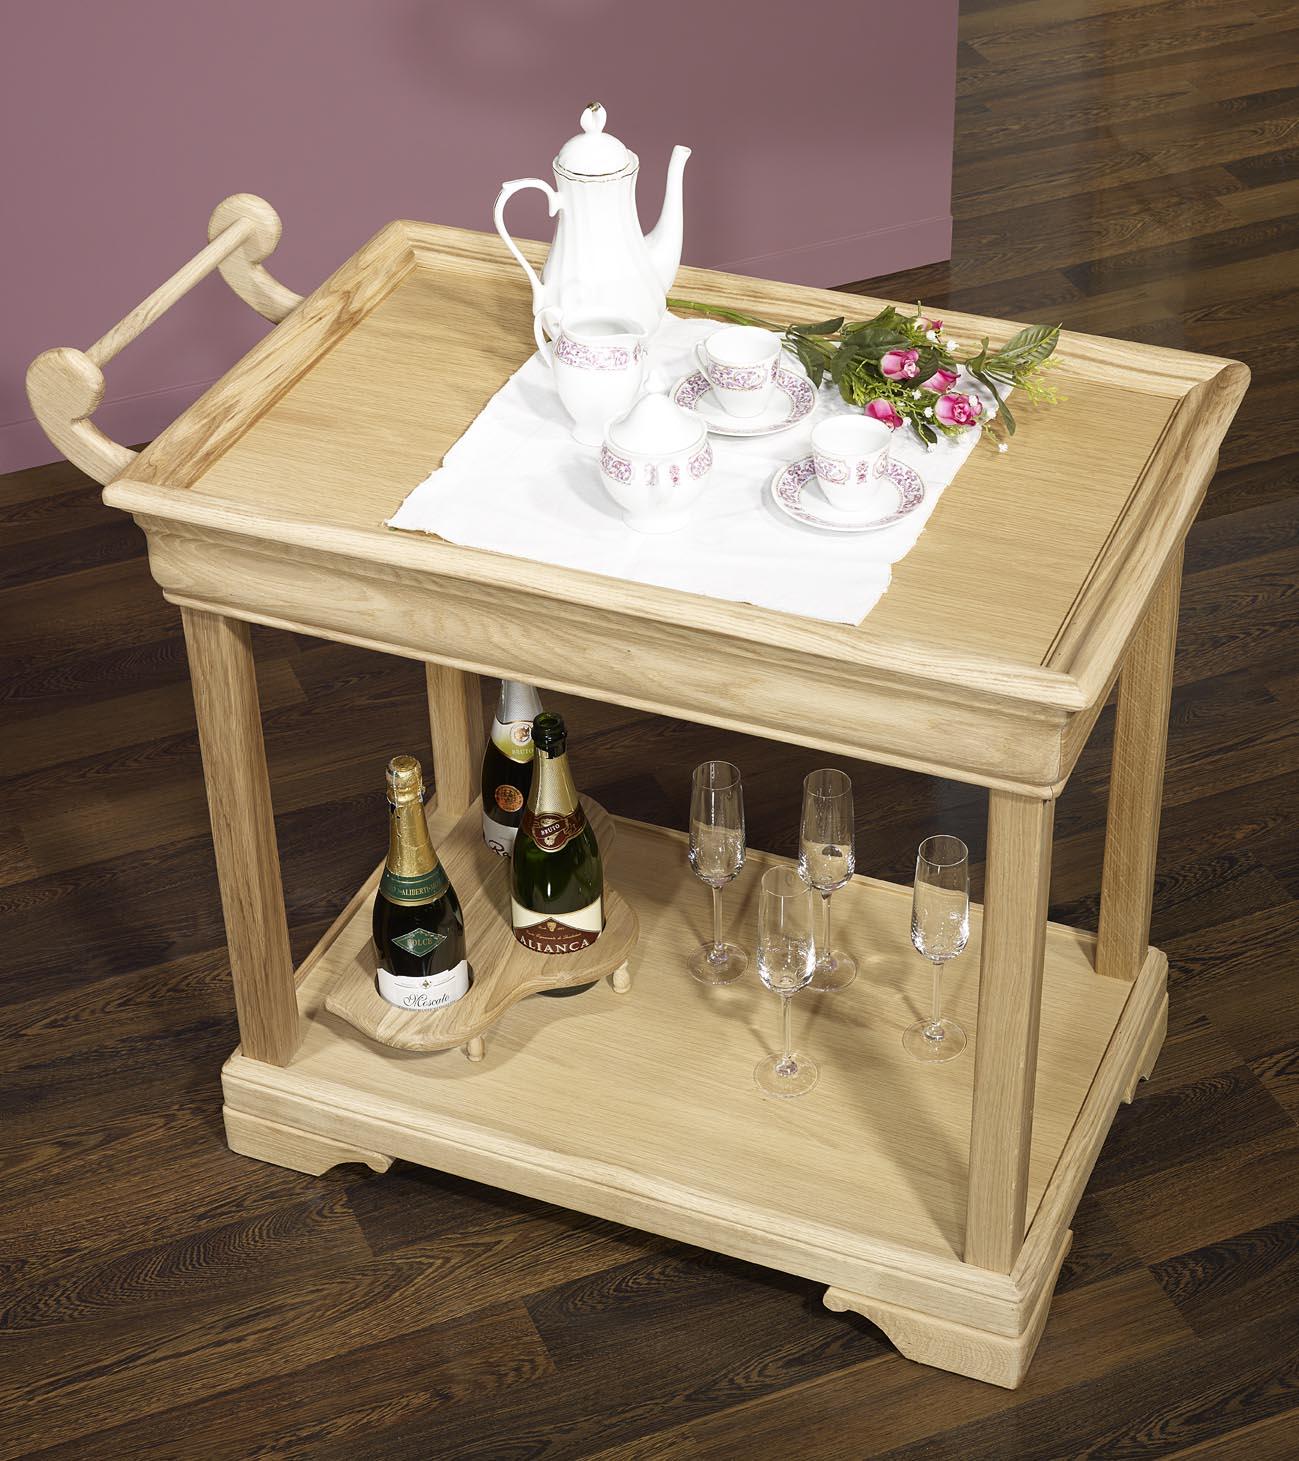 Meuble en chne table desserte roulante en chne de style - Table desserte roulante ...